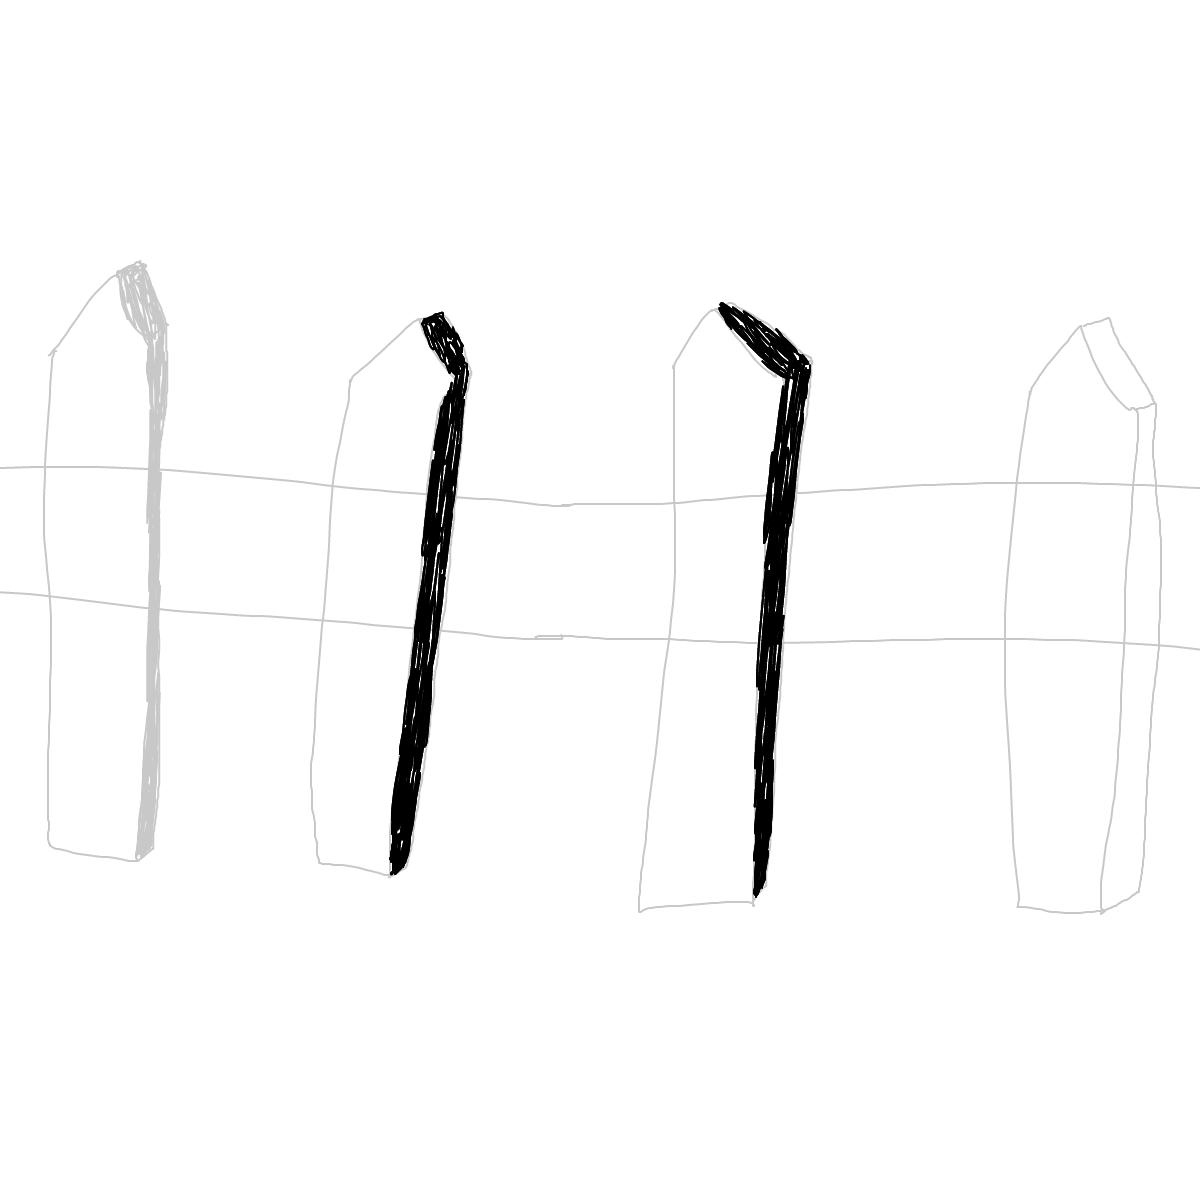 BAAAM drawing#9382 lat:52.4750480651855500lng: 13.4072656631469730